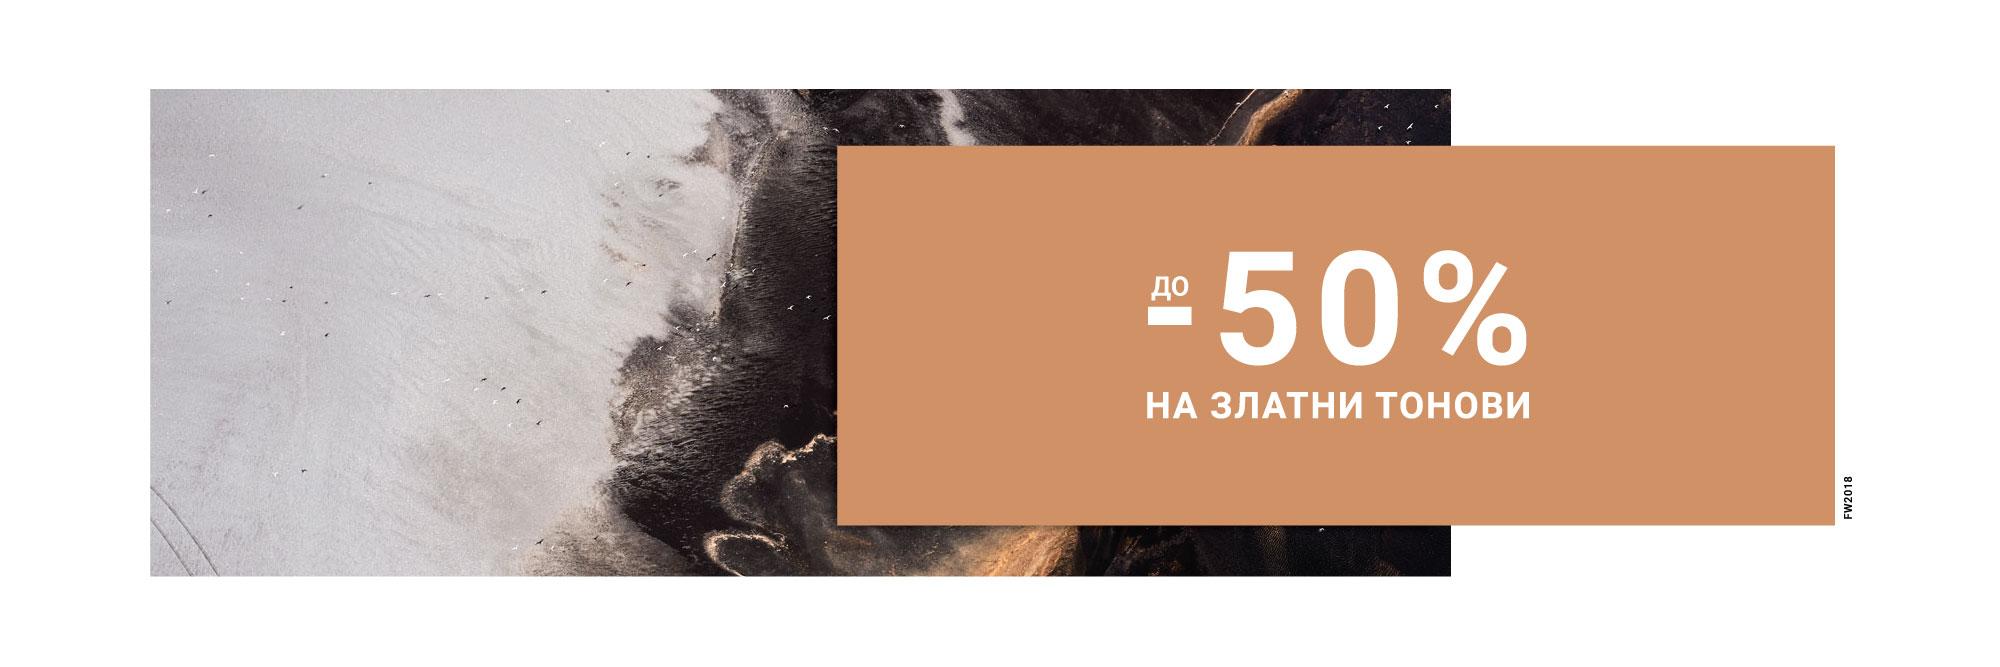 -50% zlatni tonovi